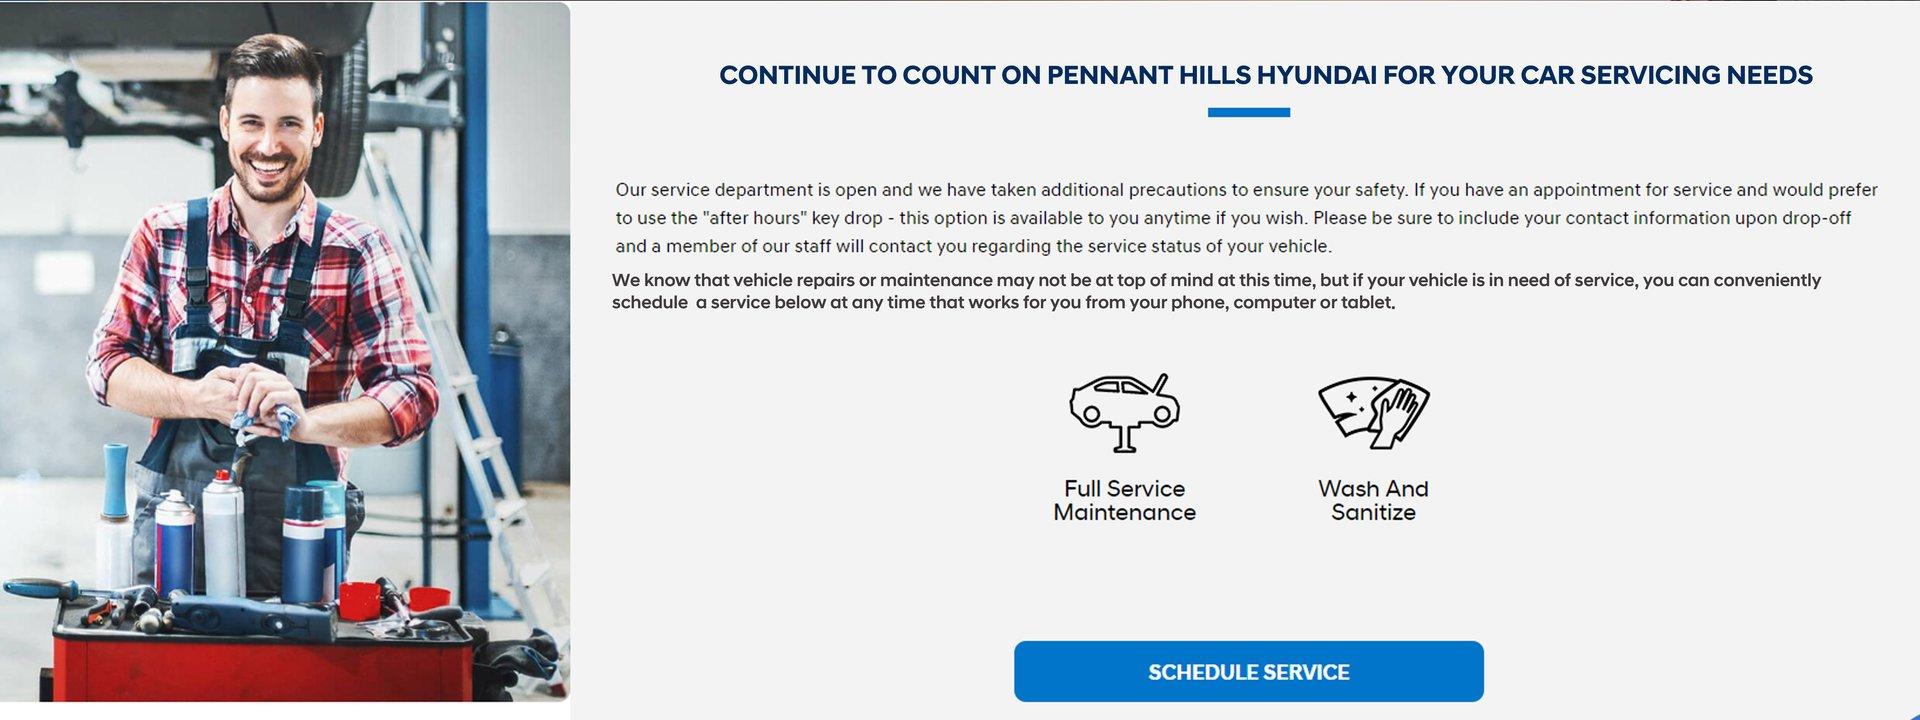 Pennant Hills Hyundai -